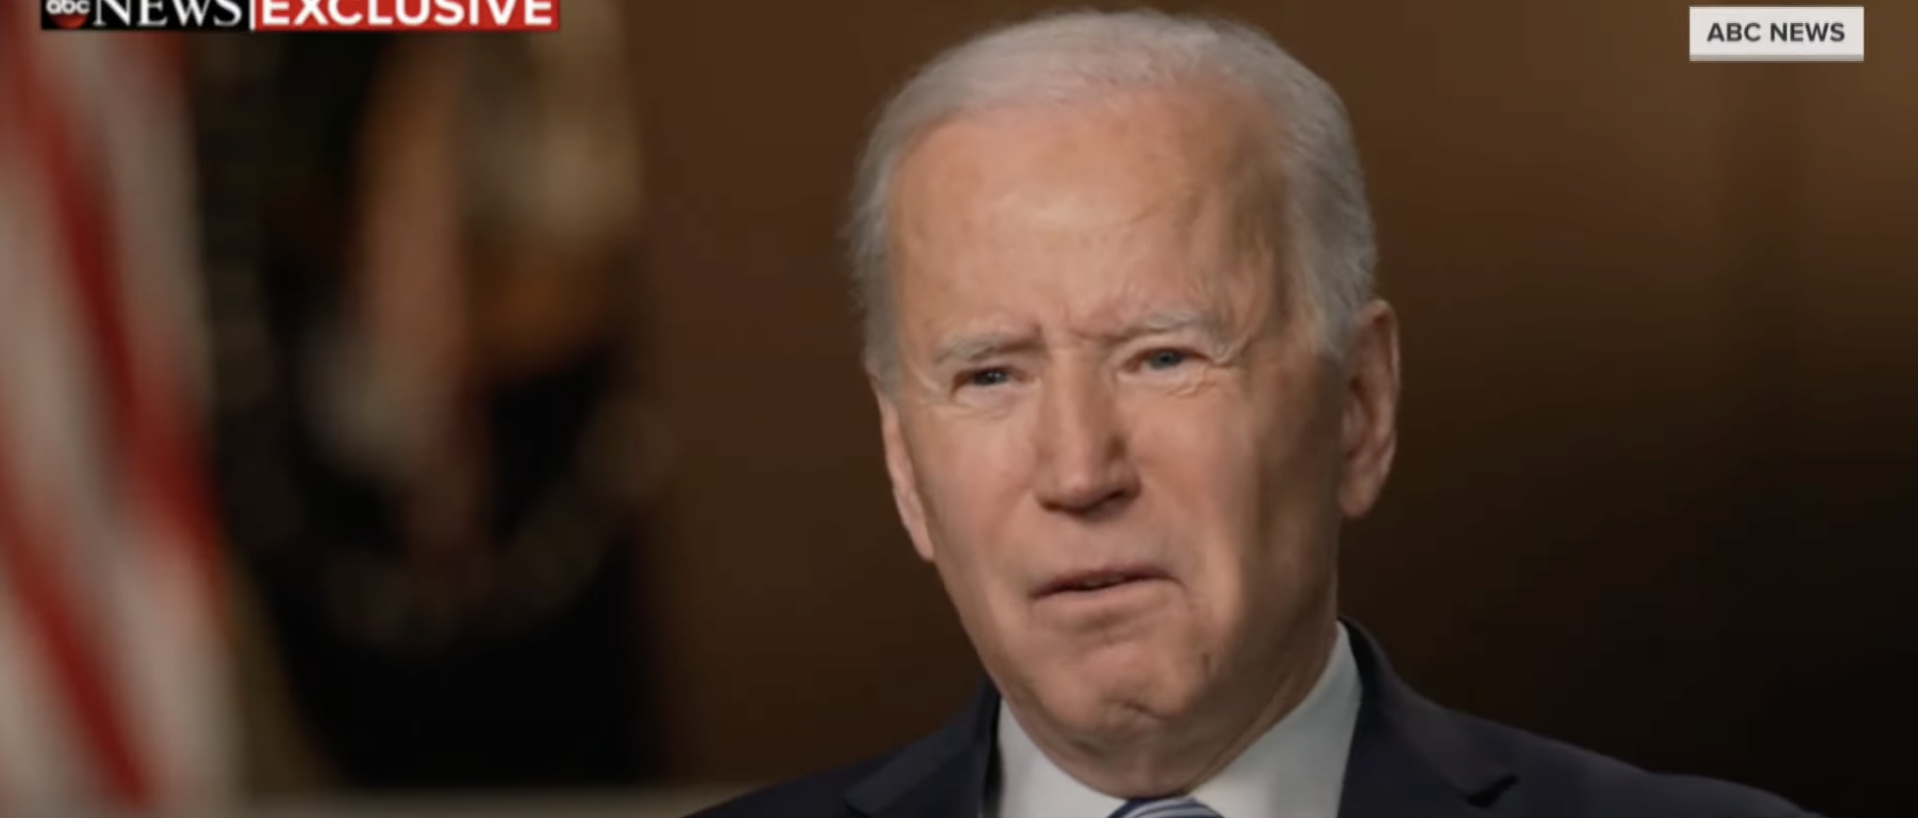 Biden speaks about border crisis, March 17, 2021 (YouTube screenshot) spectator.org